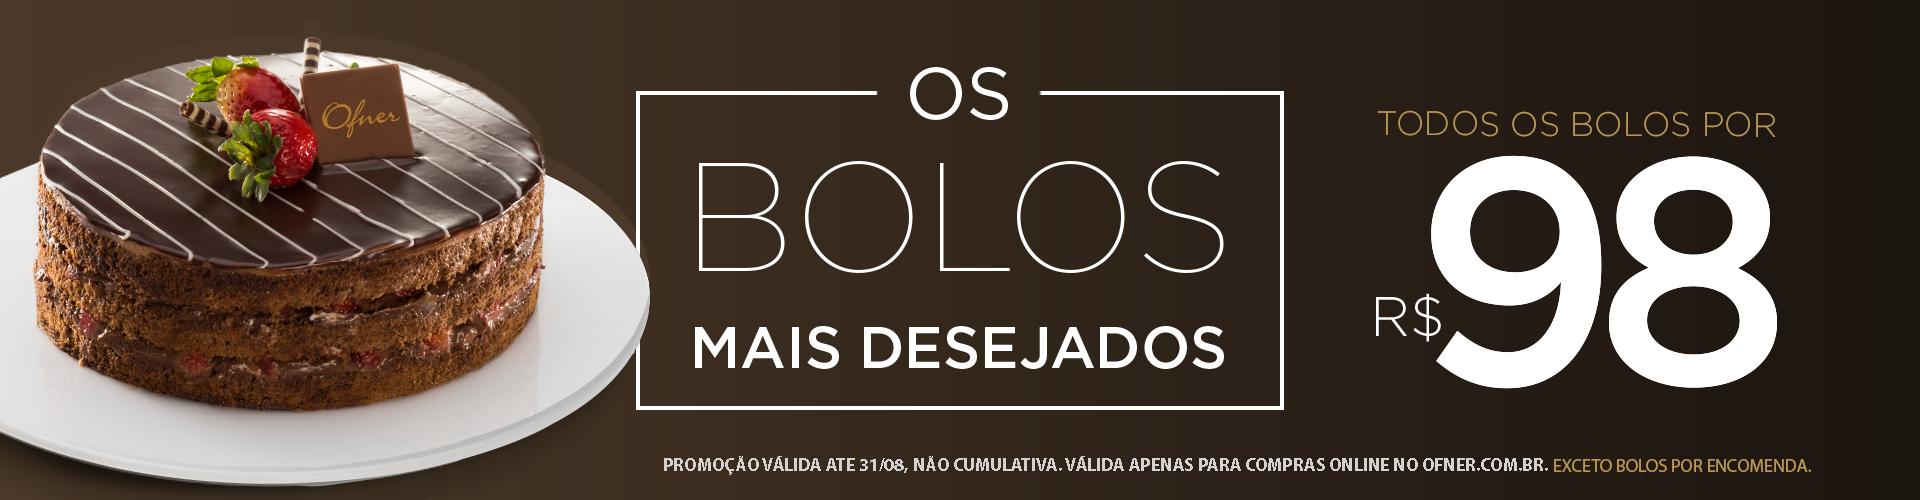 Banner Campanha bolos